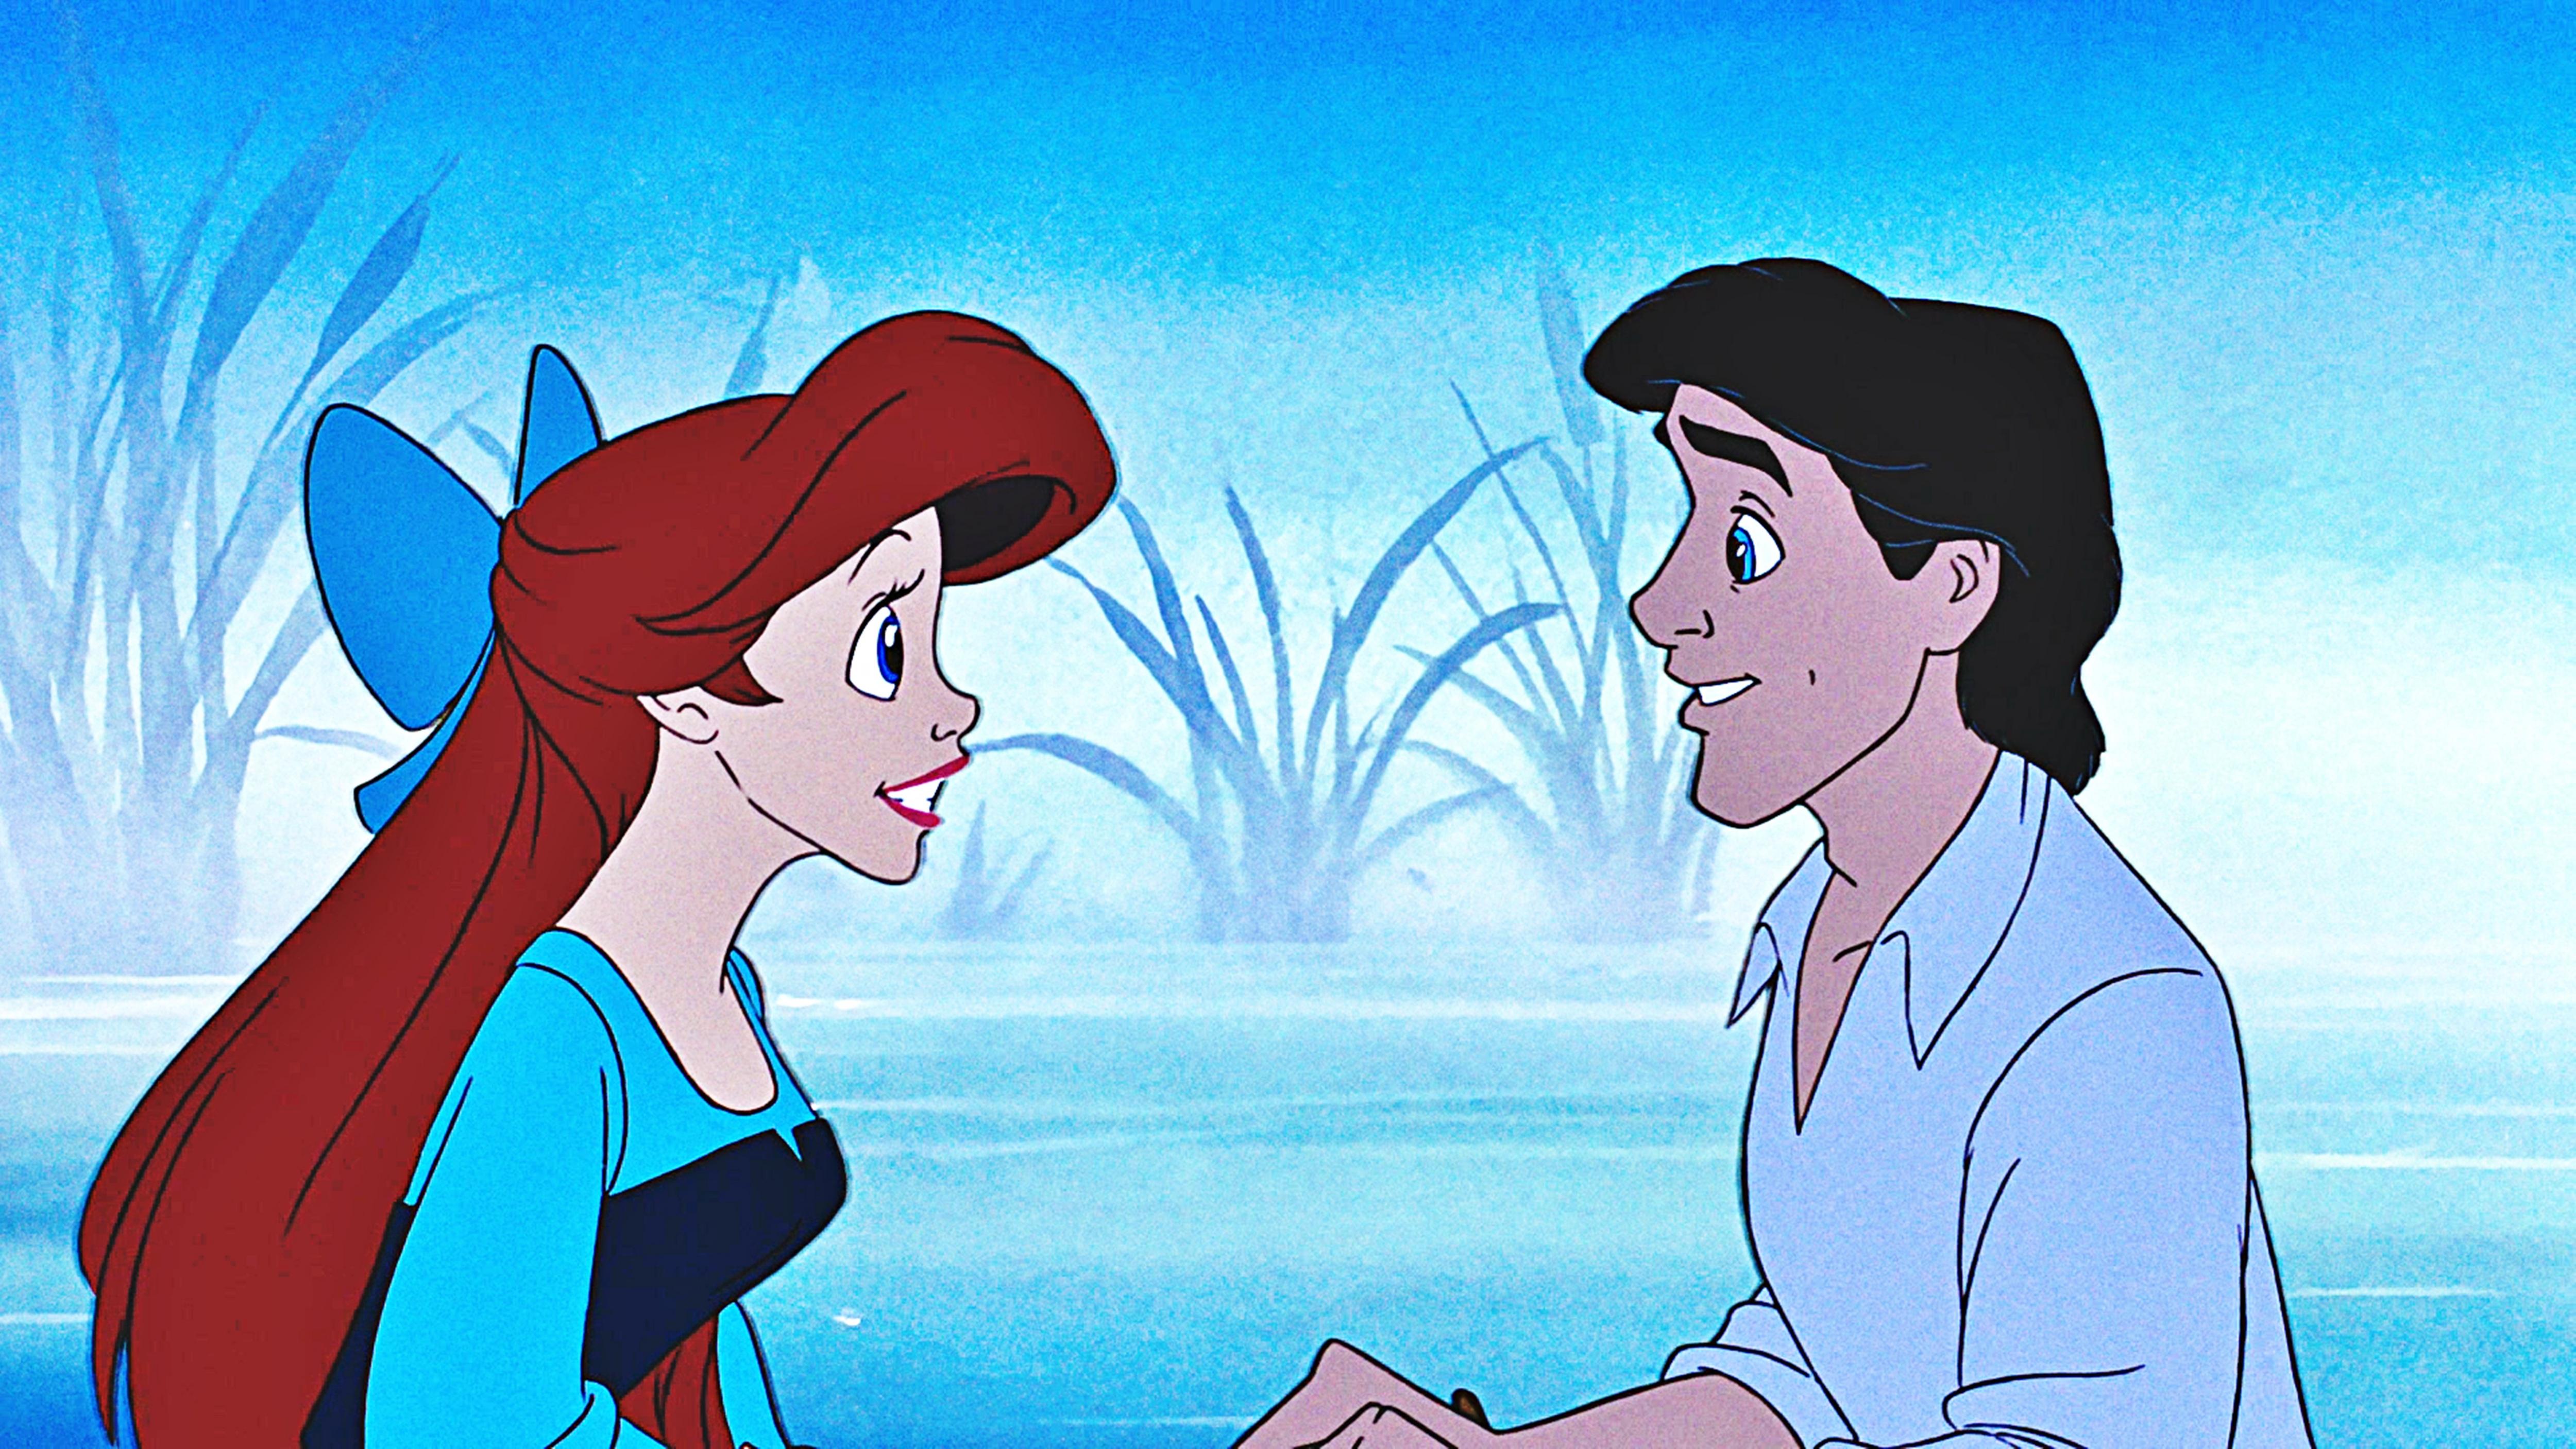 Disney Princess Screencaps - Princess Ariel & Prince Eric